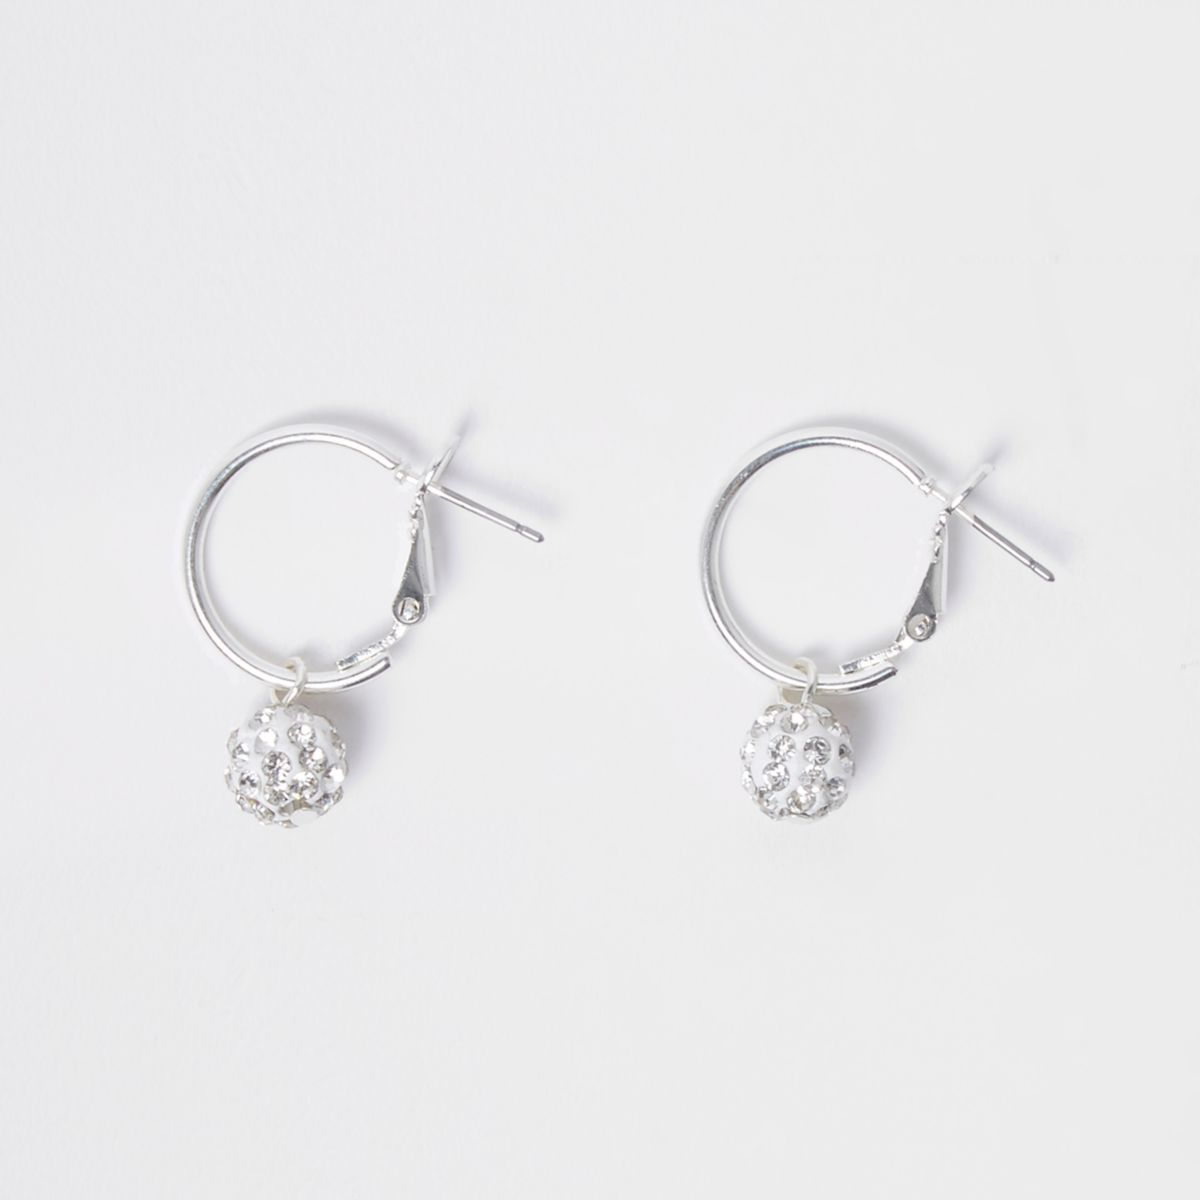 Silver tone rhinestone ball hoop earrings